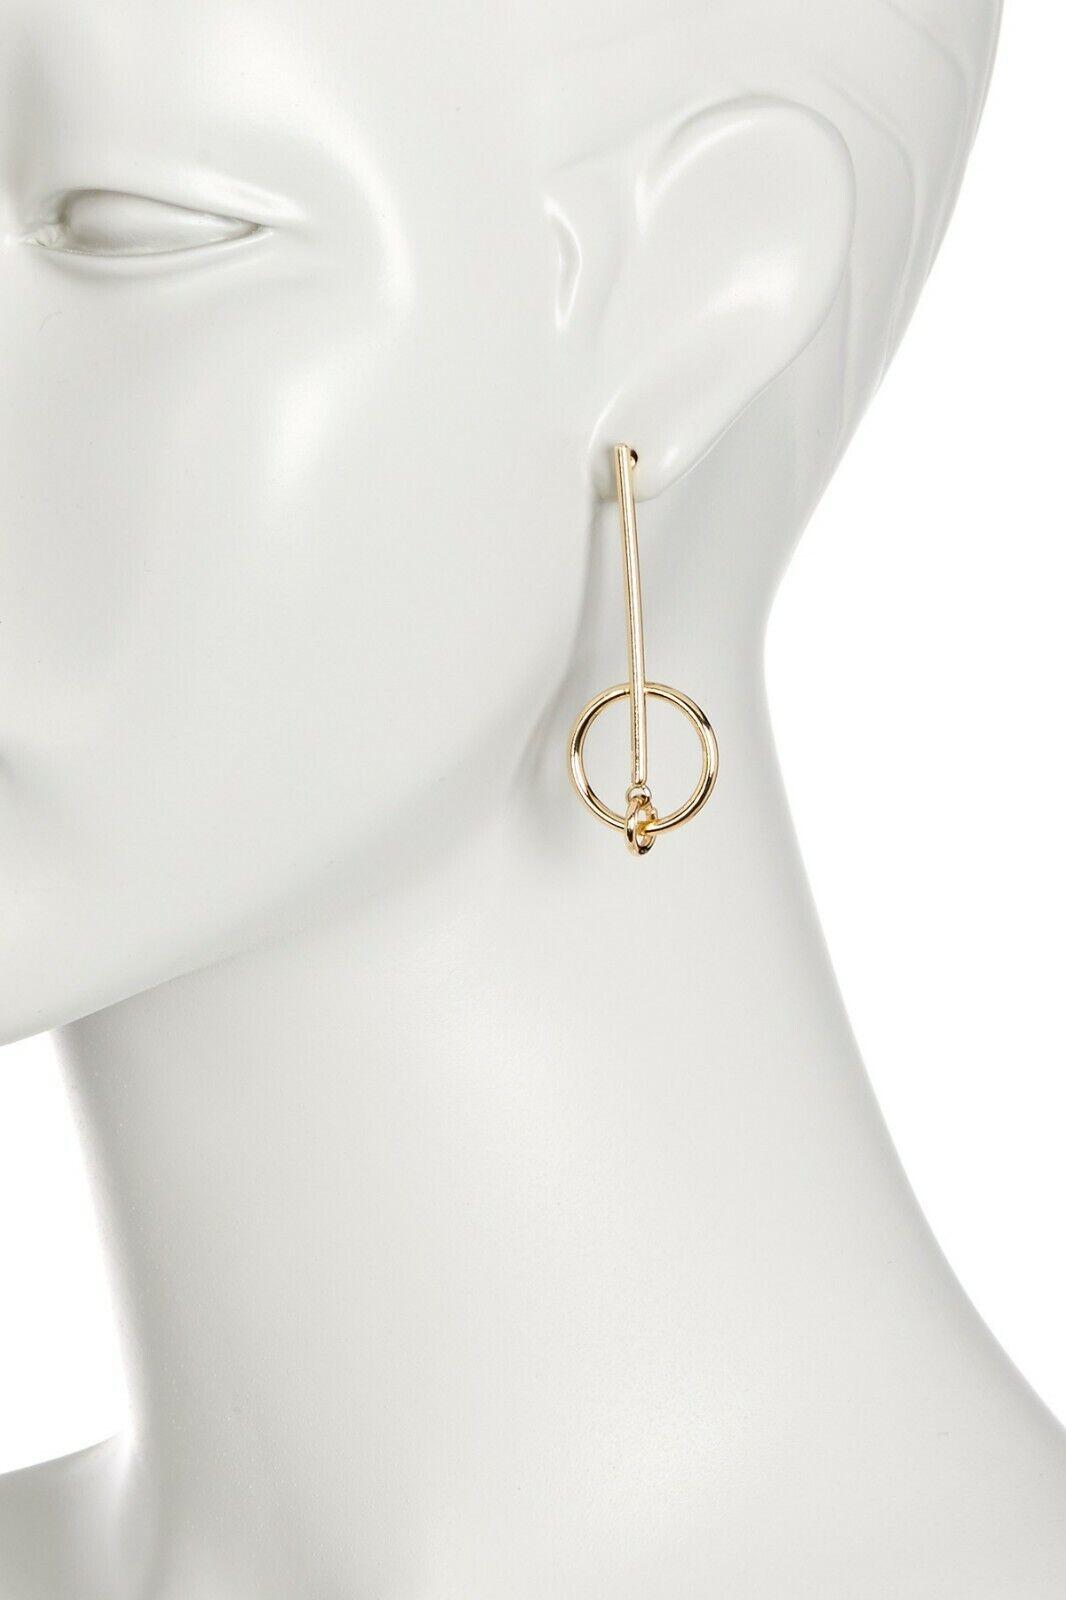 009a9058db8d2 Nordstrom Rack 14th & Union Women's Double Hoop Earrings Gold